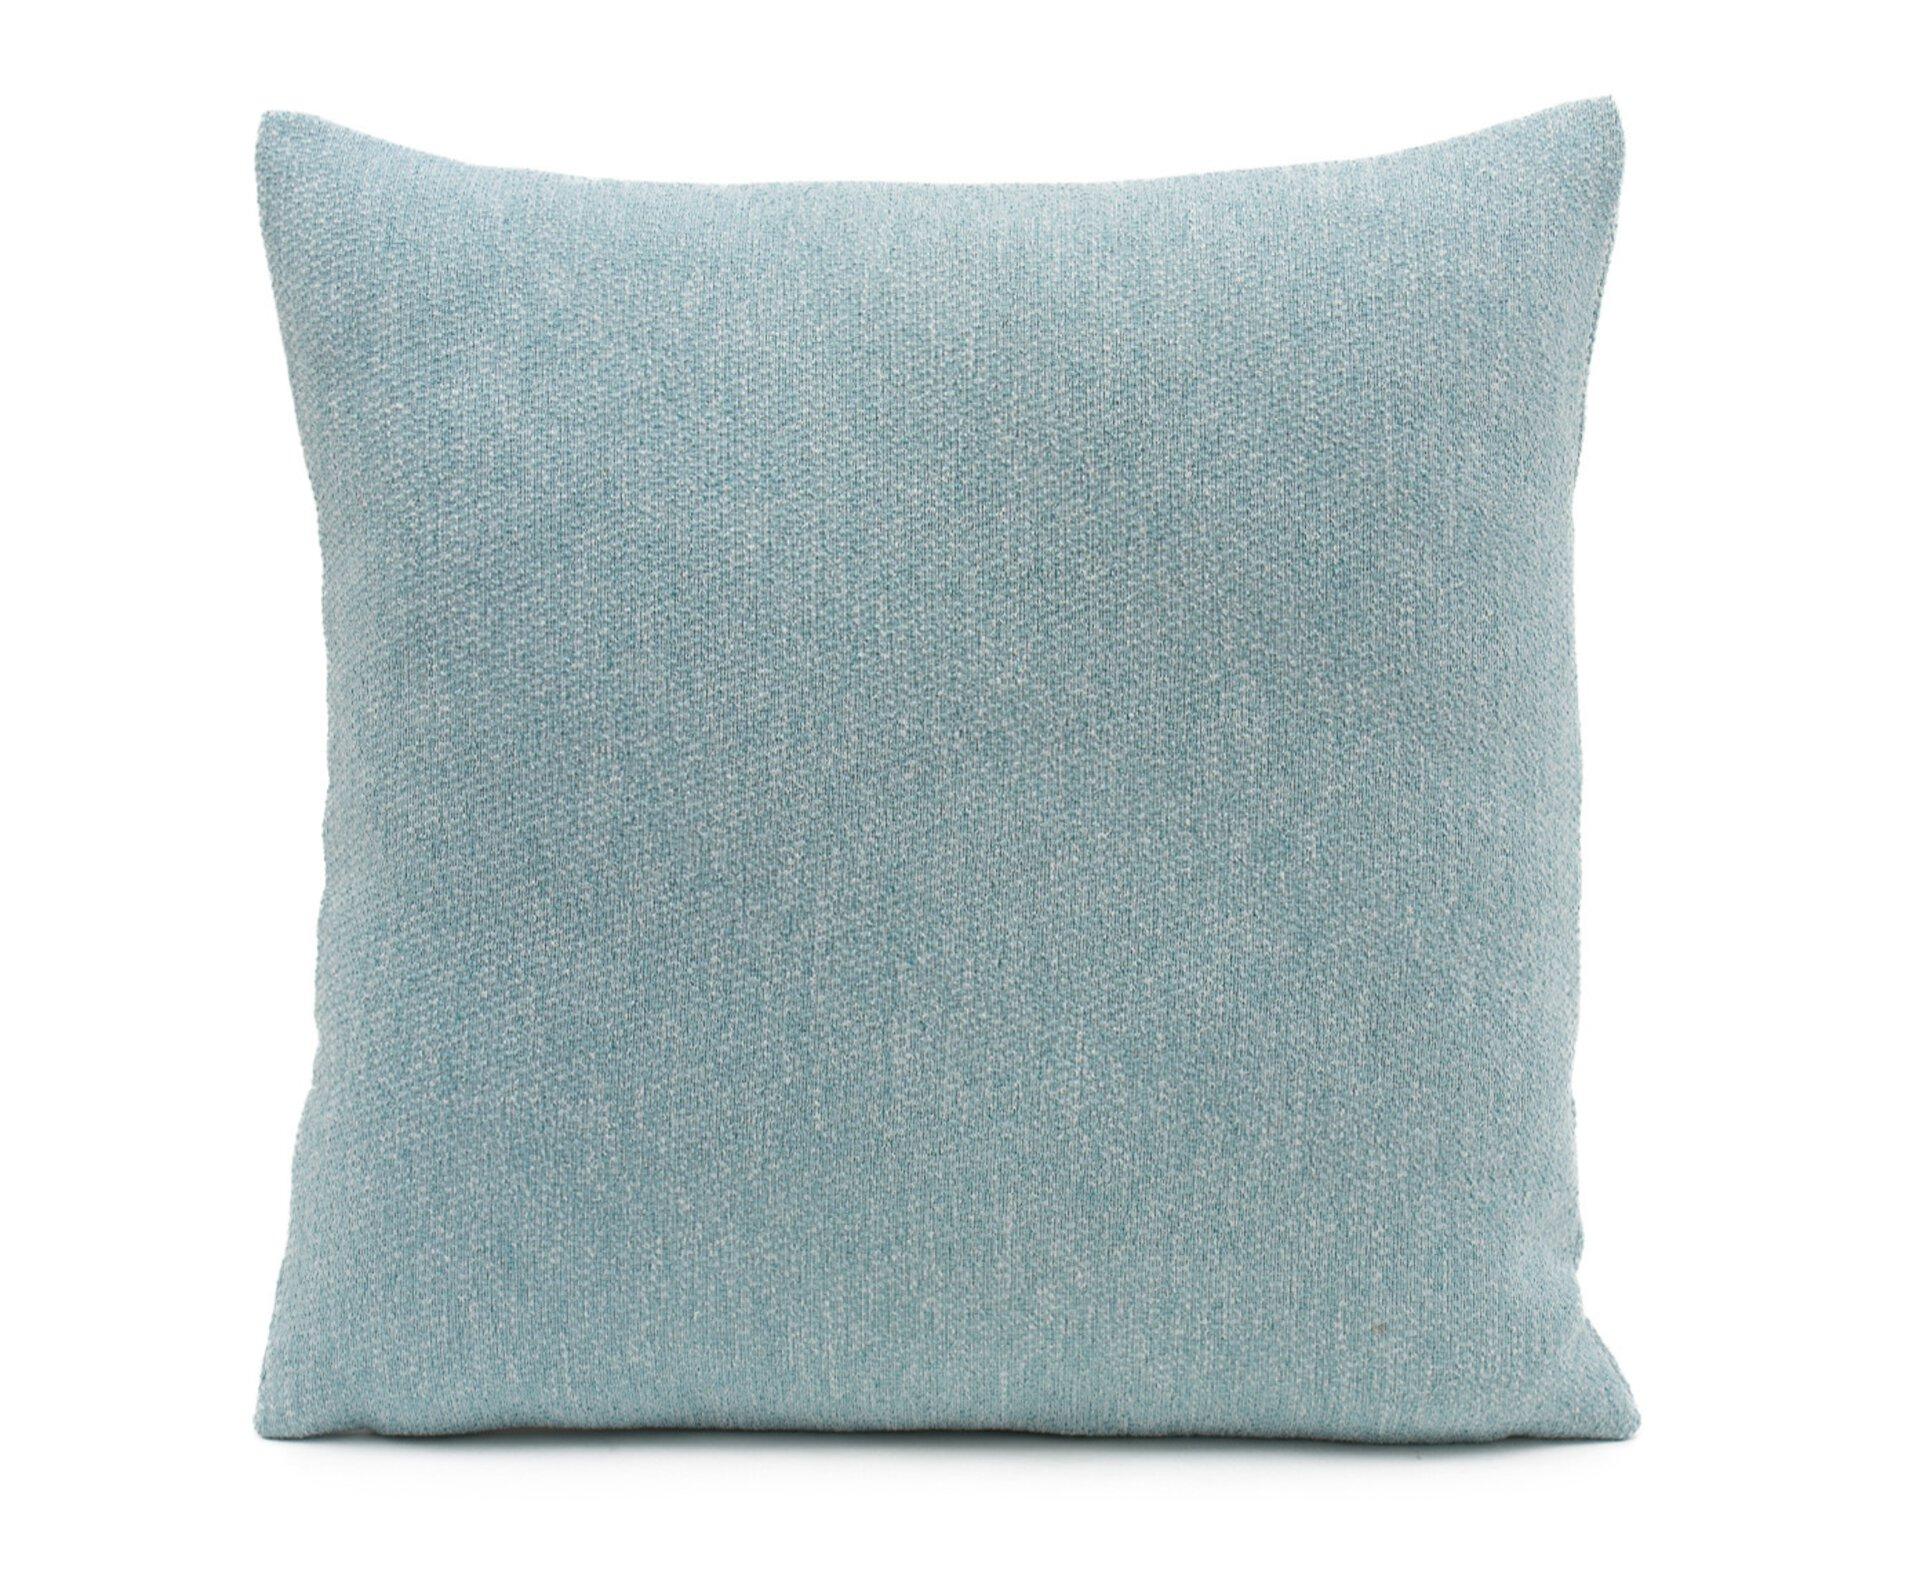 Kissenhülle Fabricio Ambiente Trendlife Textil Blau 40 x 40 cm